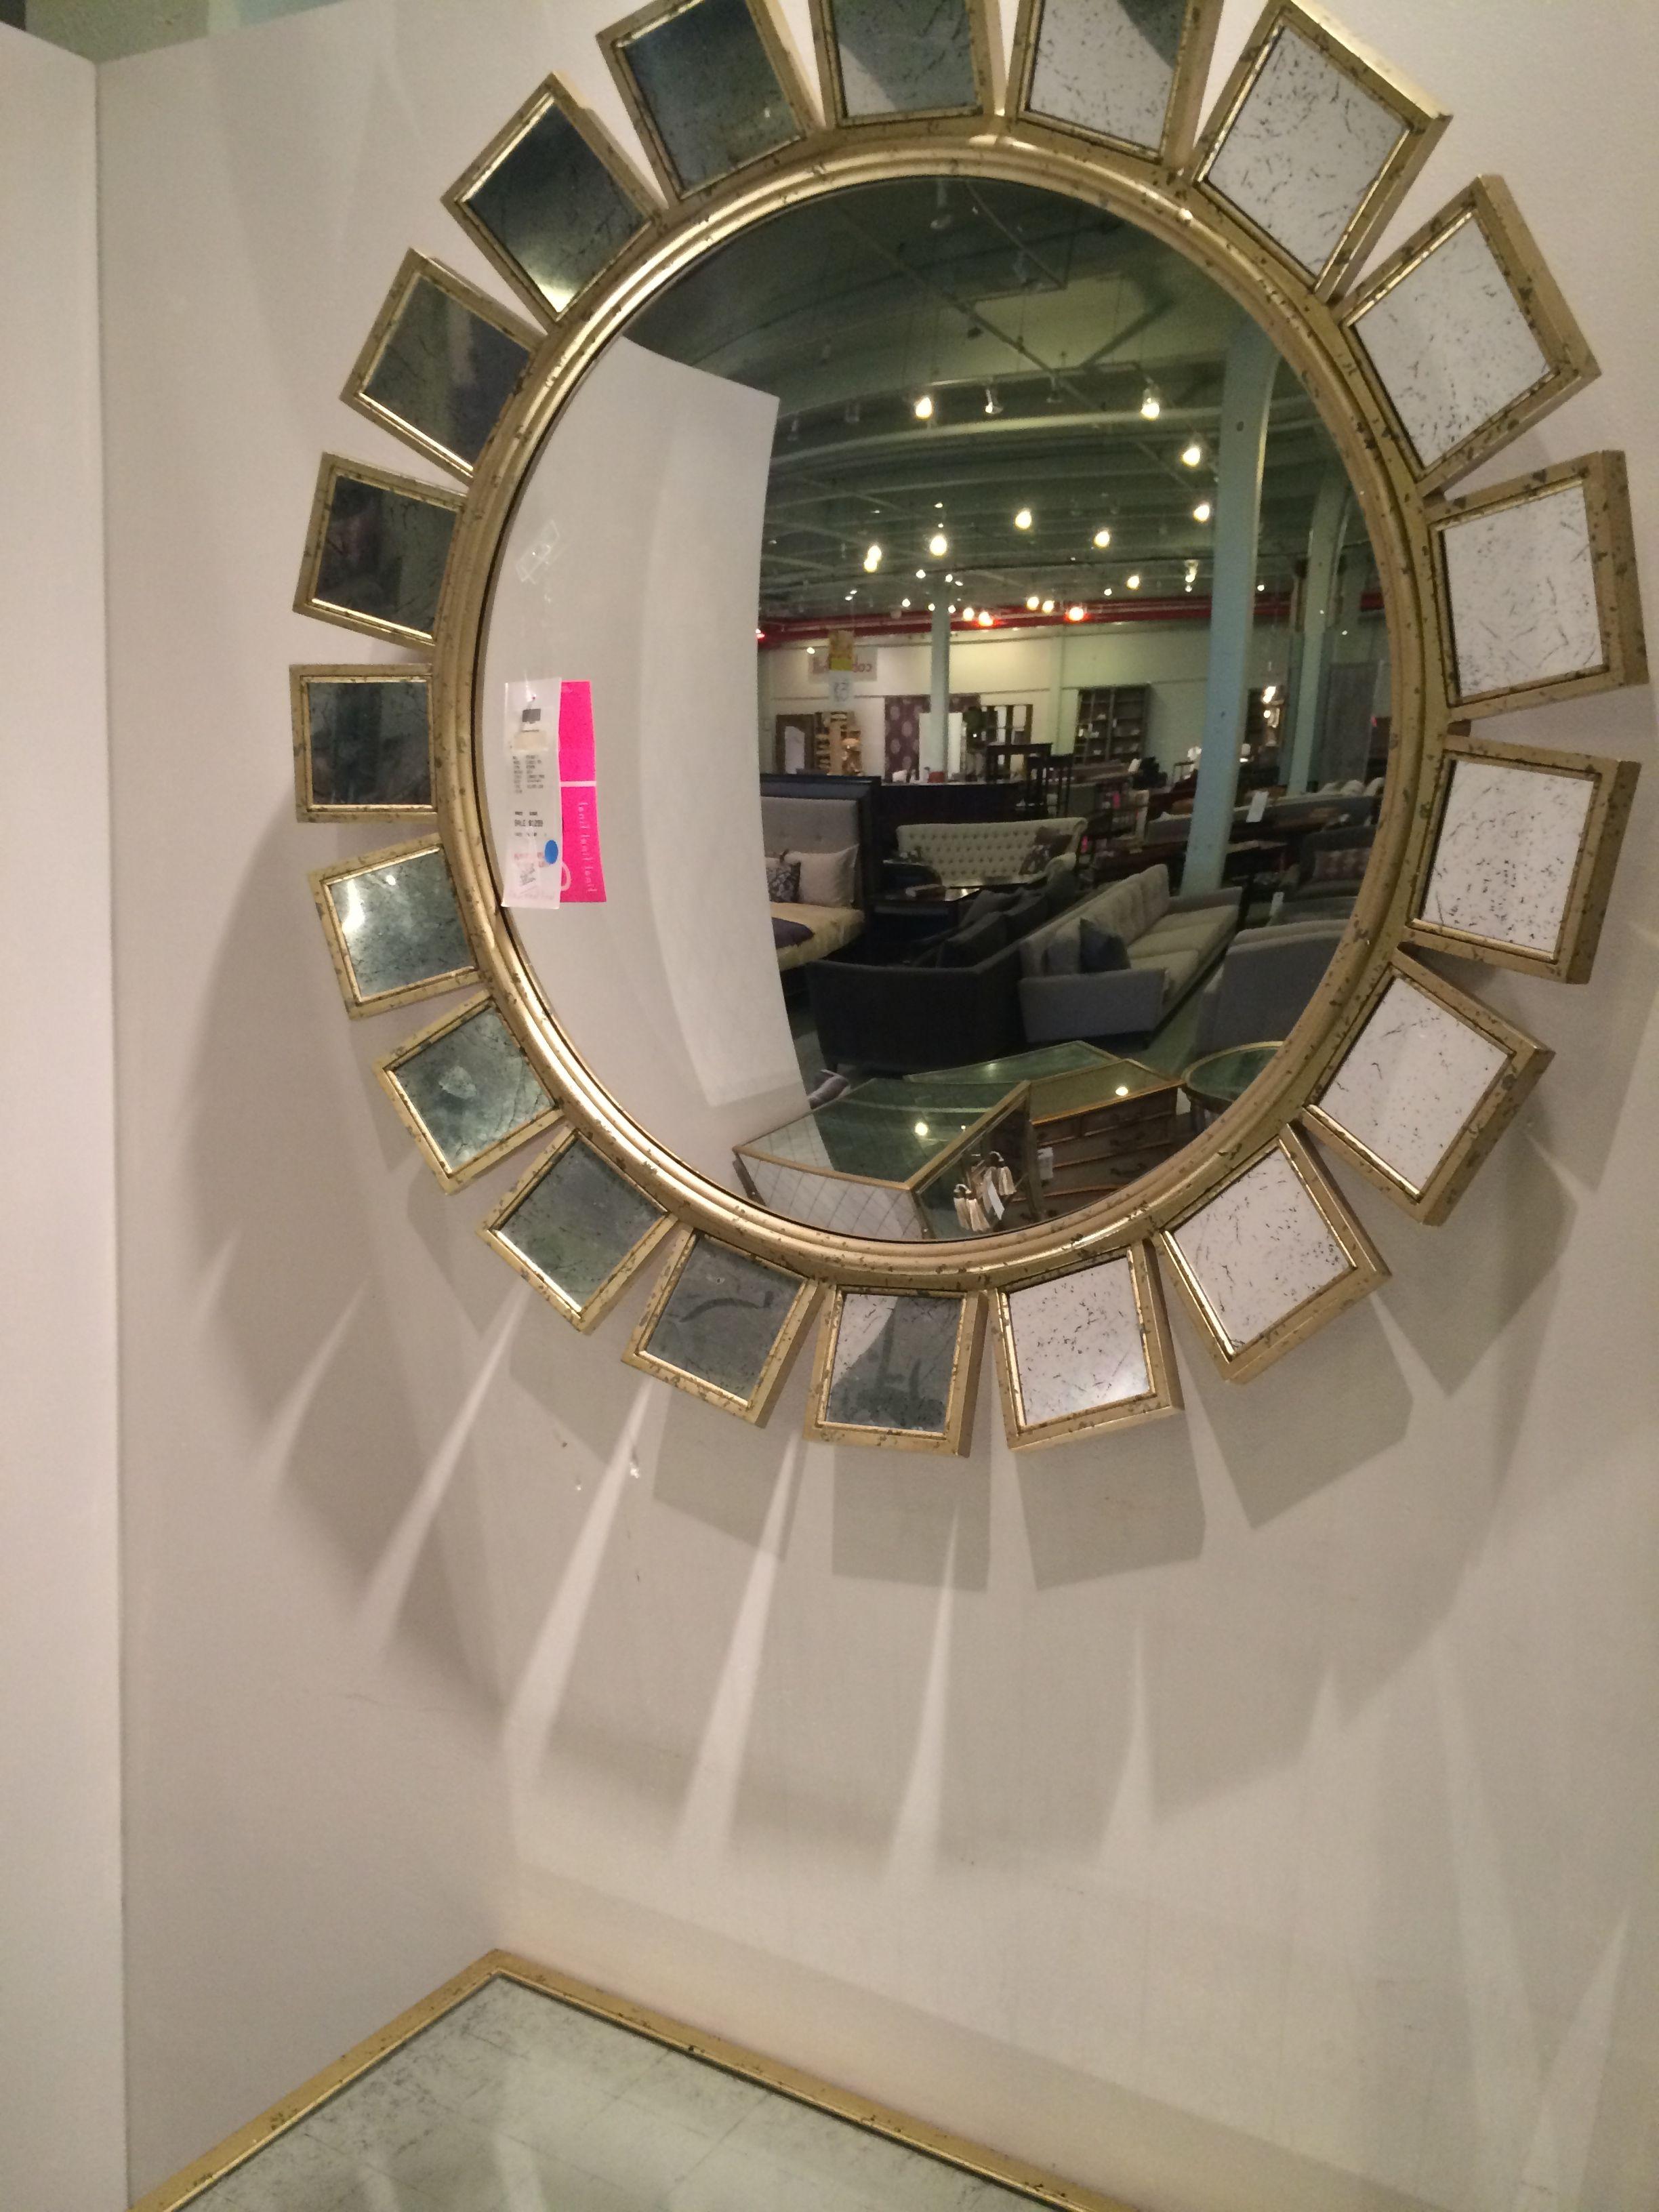 mirrors decor mirror decorative off round horchow